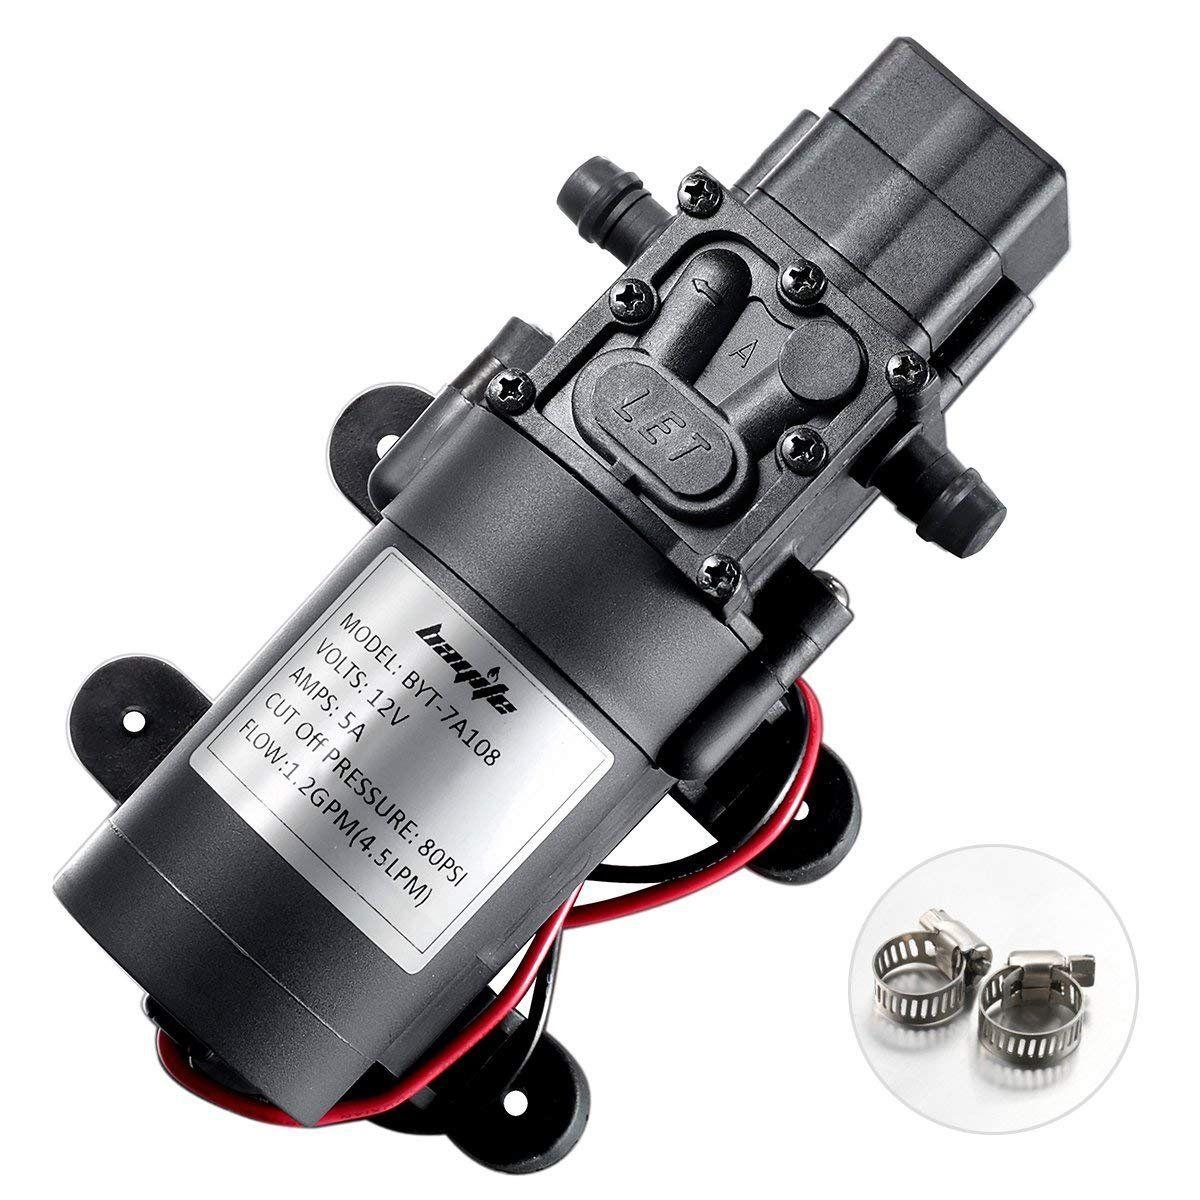 Bayite 12v Dc Fresh Water Pump With 2 Hose Clamps 12 Volt Diaphragm Pump Self Priming Sprayer Pump With Pressure Switch 4 5 L Mi In 2020 Diaphragm Pump Water Pumps Van